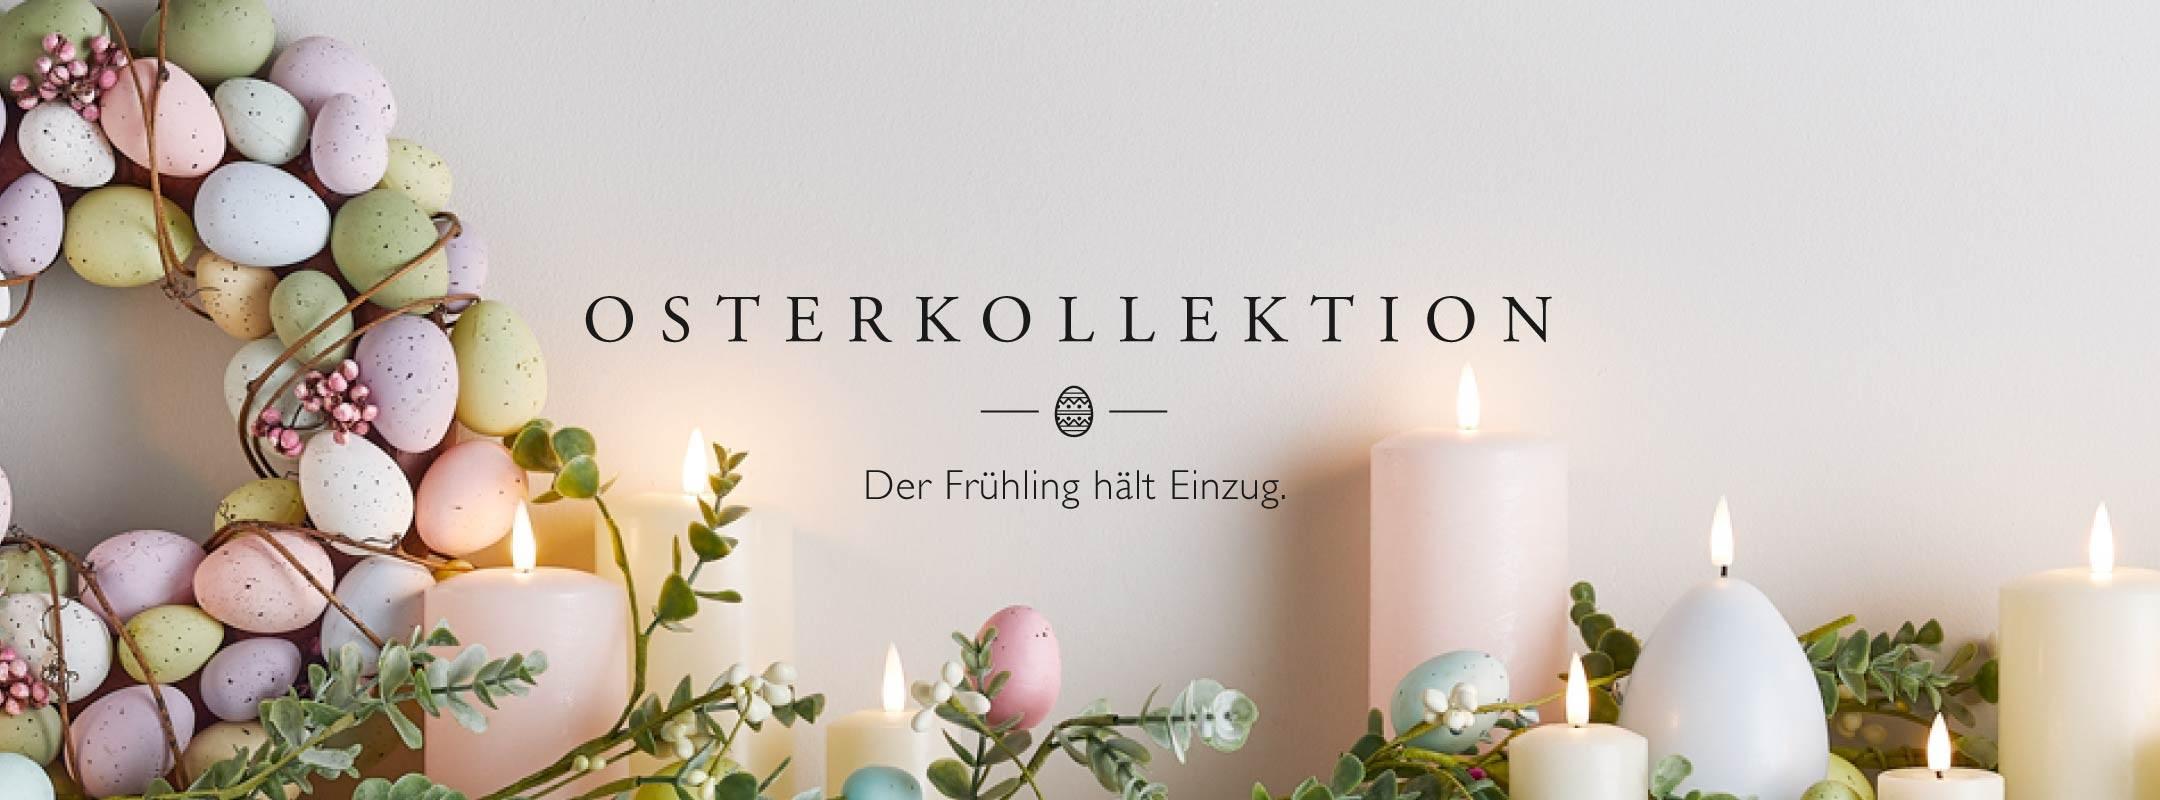 Osterkollektion pastellfarbene LED Kerzen und Osterkranz